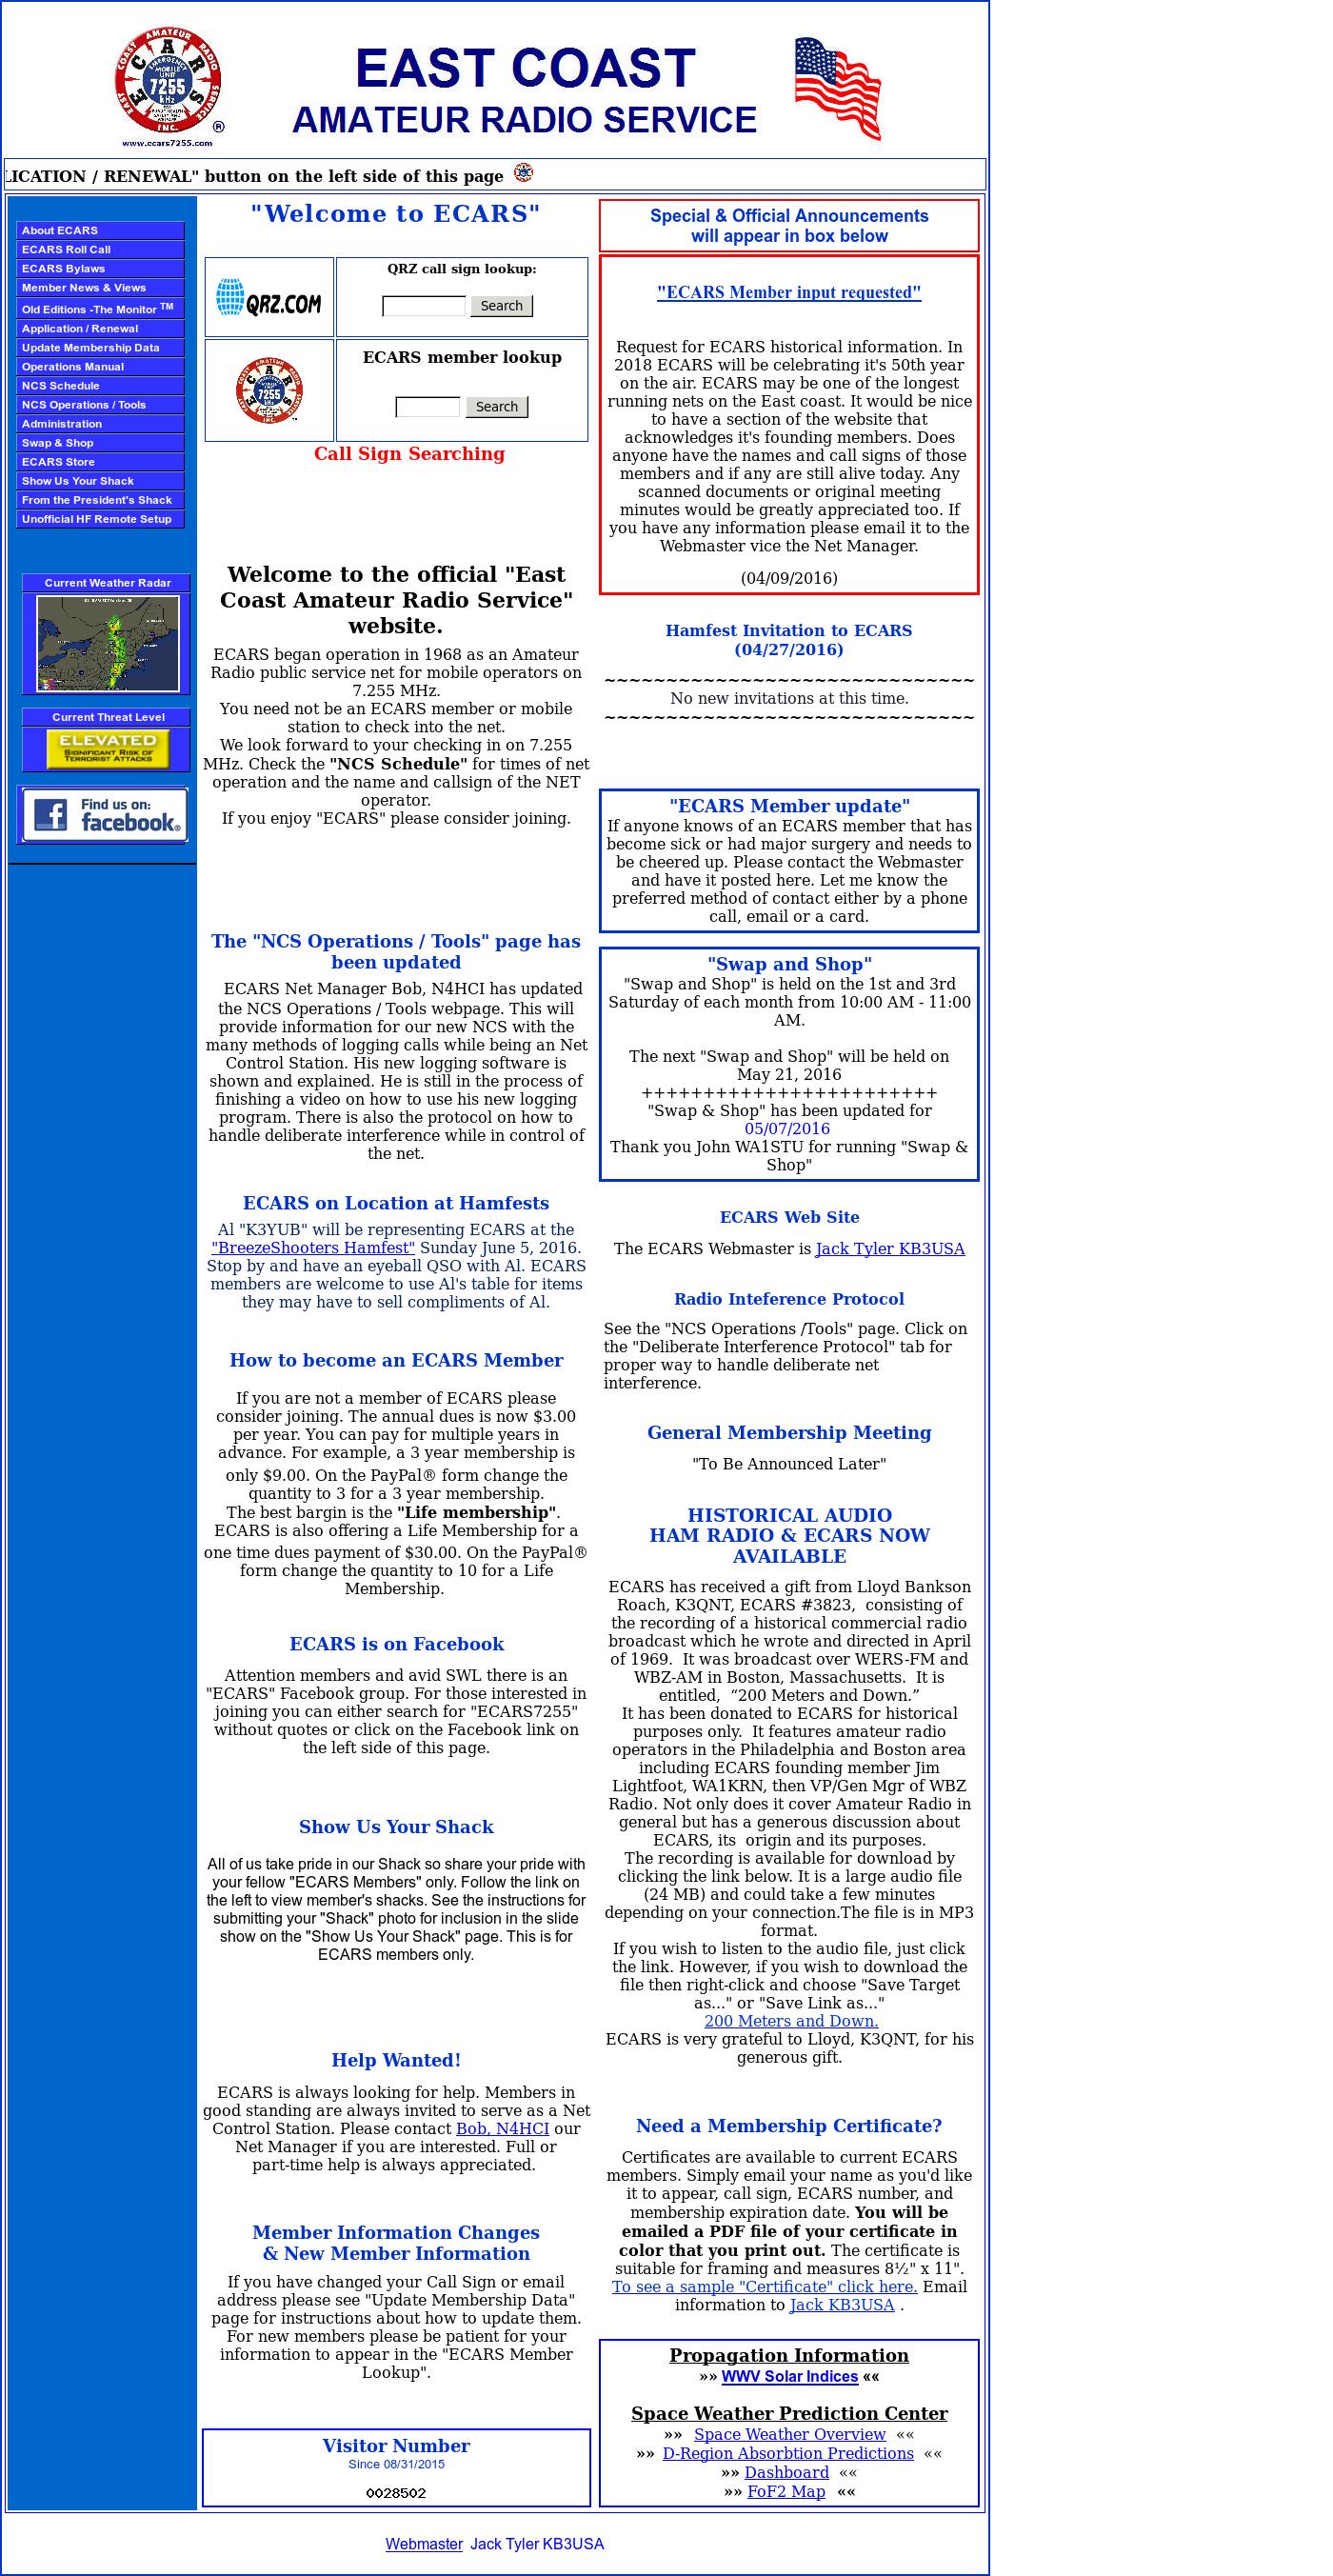 East Coast Amateur Radio Service Competitors, Revenue and